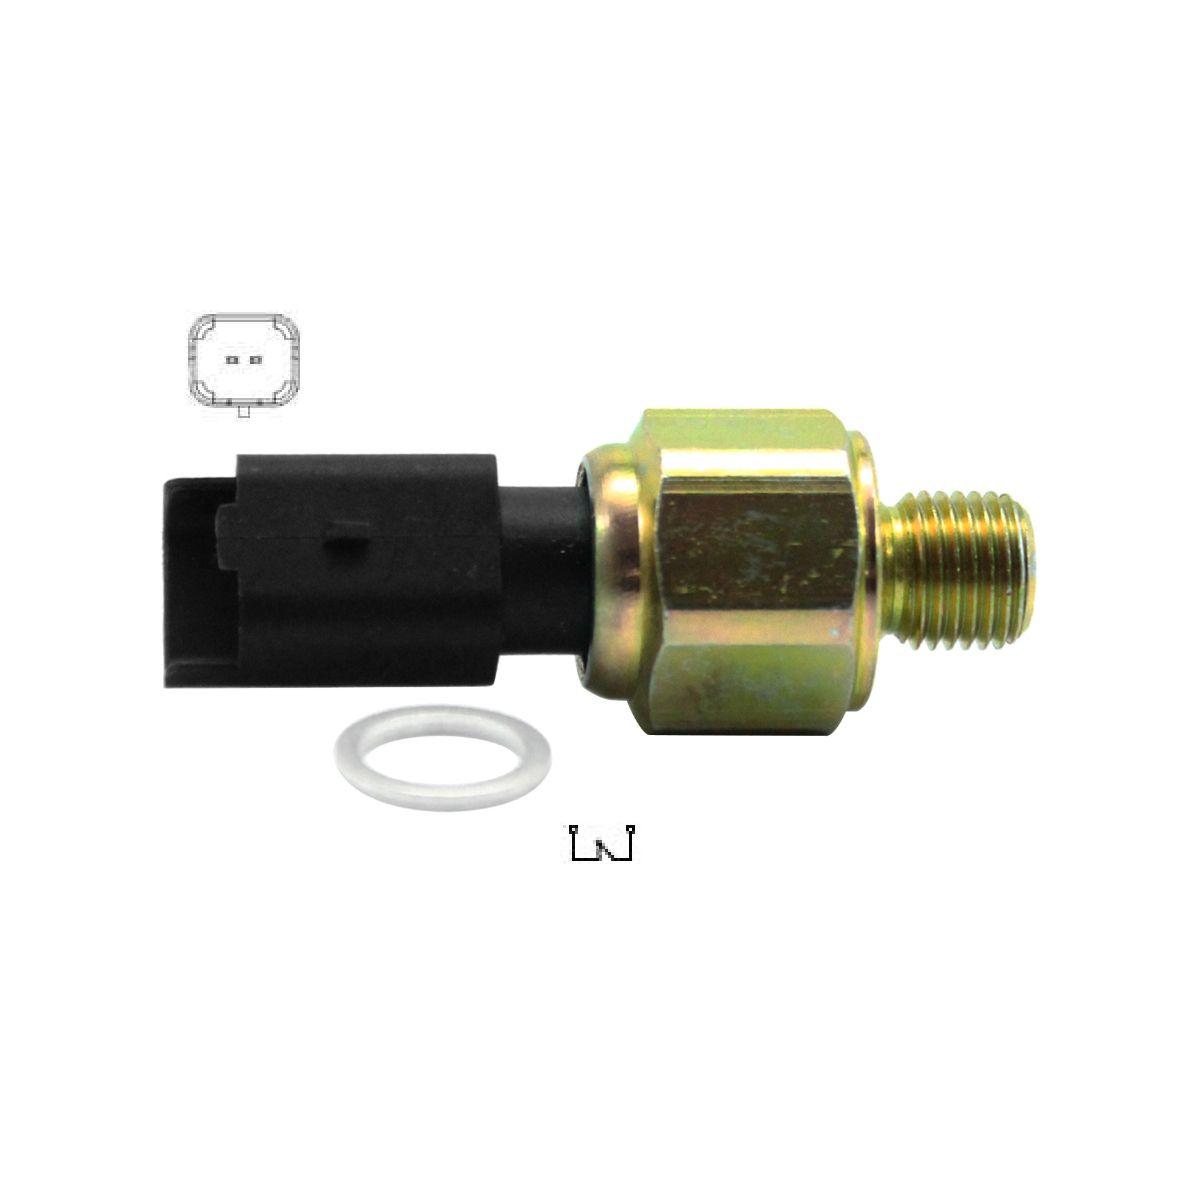 Interruptor Pressão 3-RHO Direção Hidraulica Citroen / Peugeot - 9905